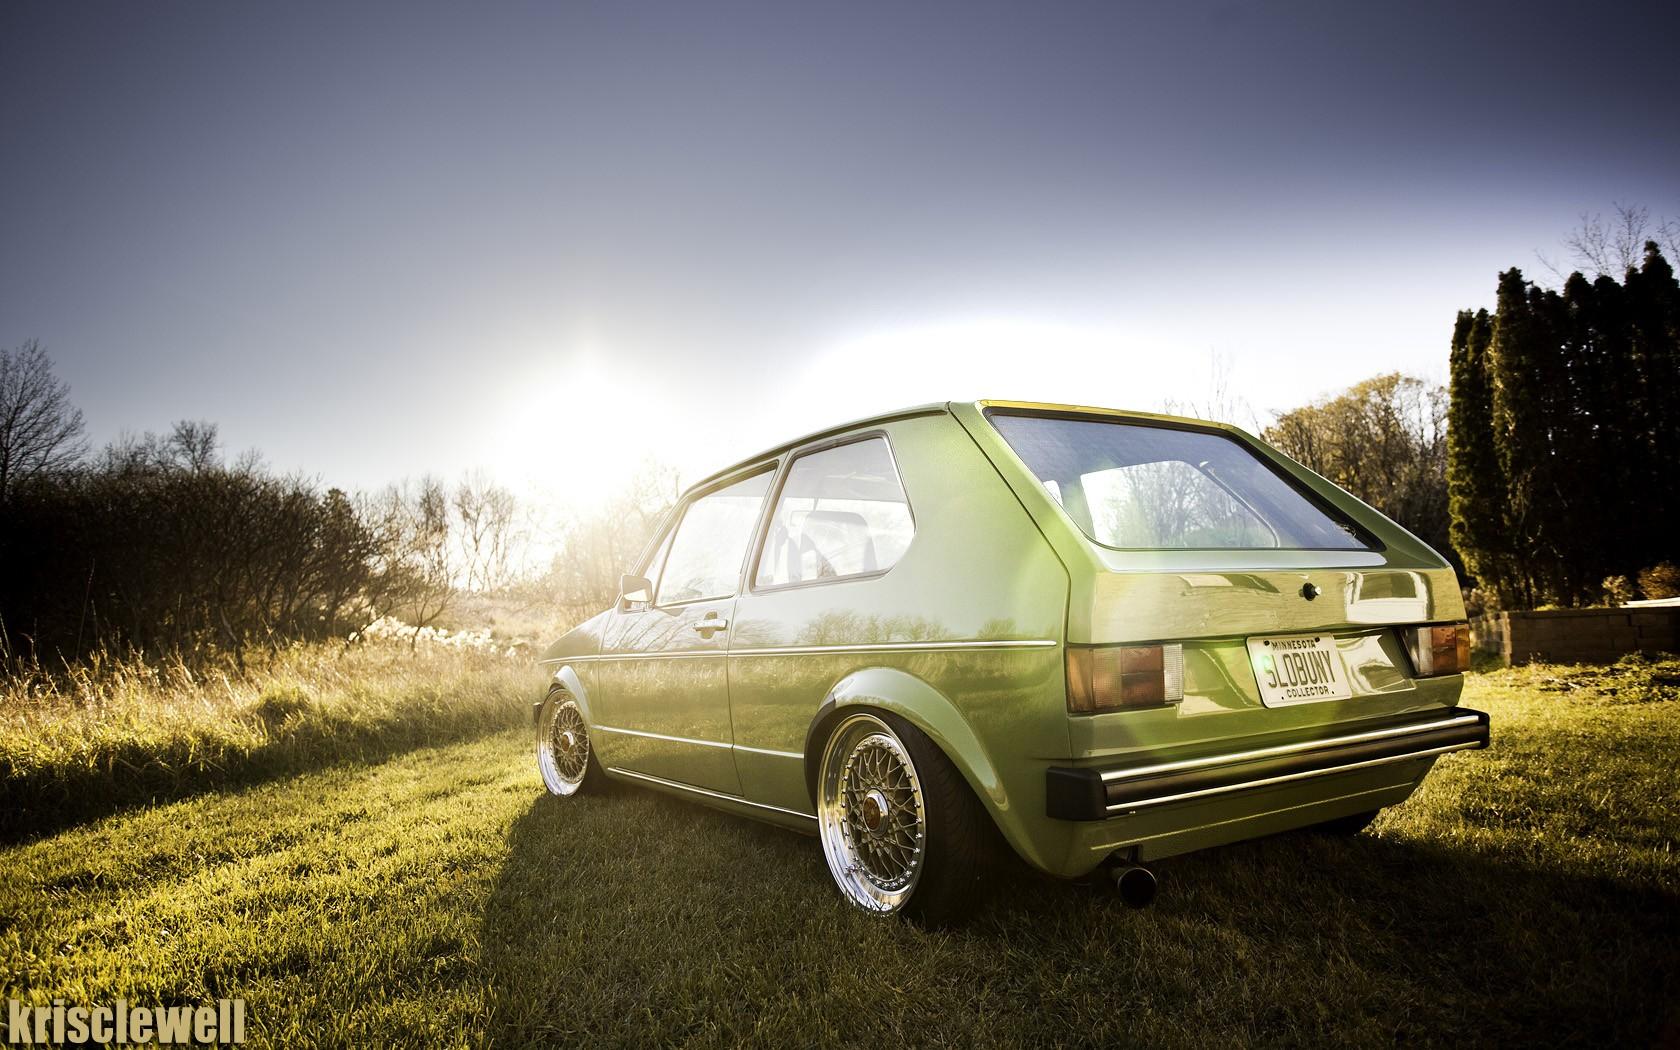 Volkswagen Golf Mk1 Wallpaper and Background Image 1680x1050 1680x1050